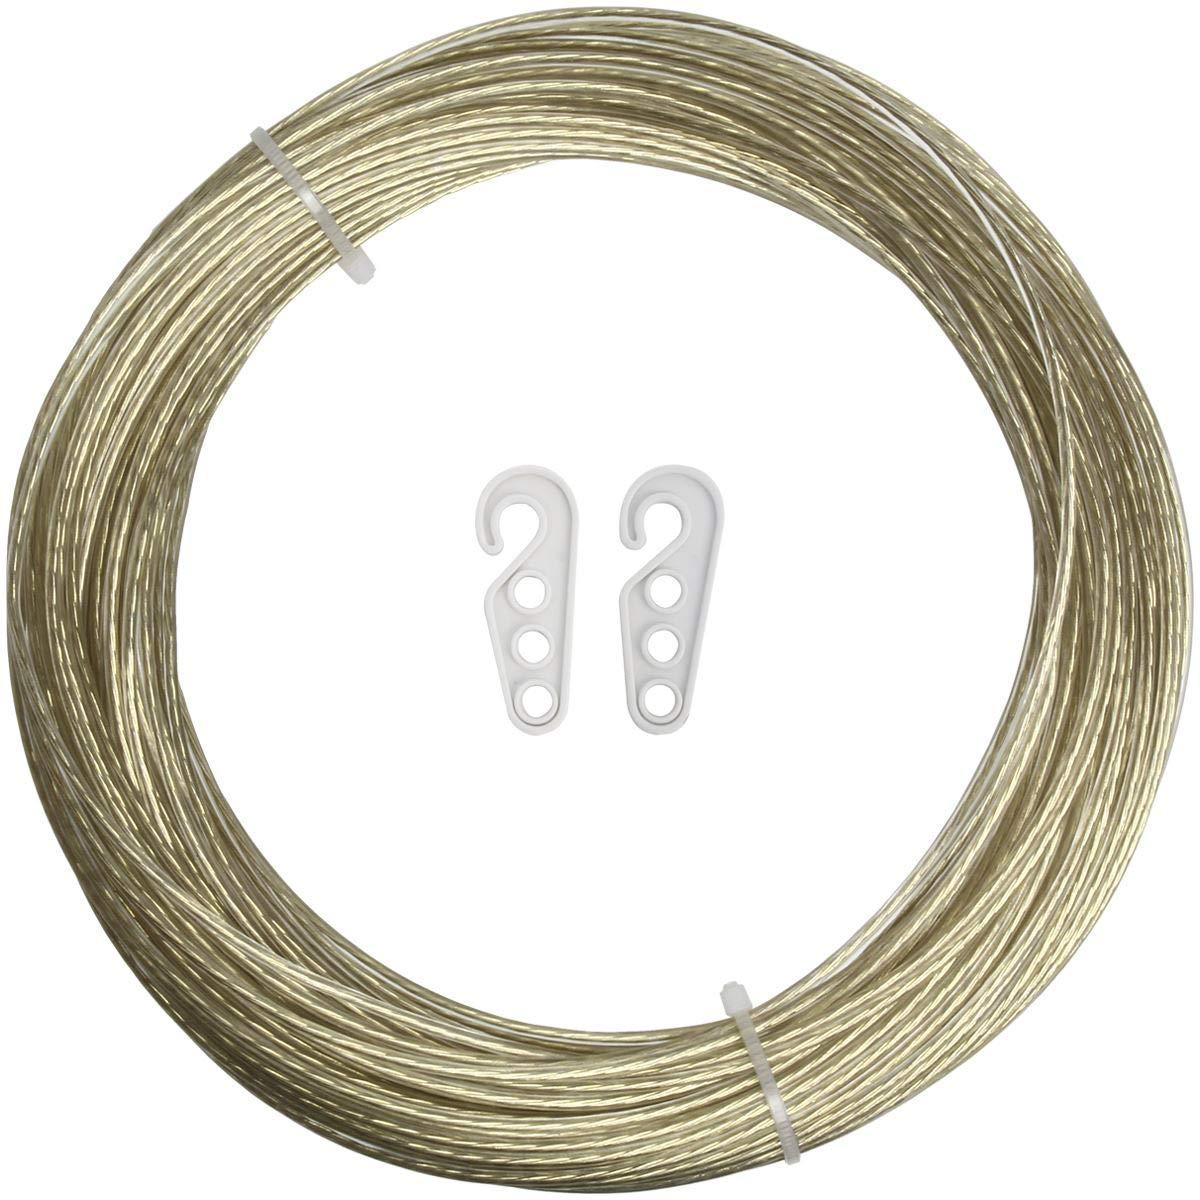 iGadgitz Home スチールコア 洗濯ロープ プラスチック PVCコーティング 衣類ロープ 洗濯ロープ 洗濯ロープ 屋外 庭 壁用 Length 98ft ゴールド U6940 B07N669MVT ゴールド Length 98ft